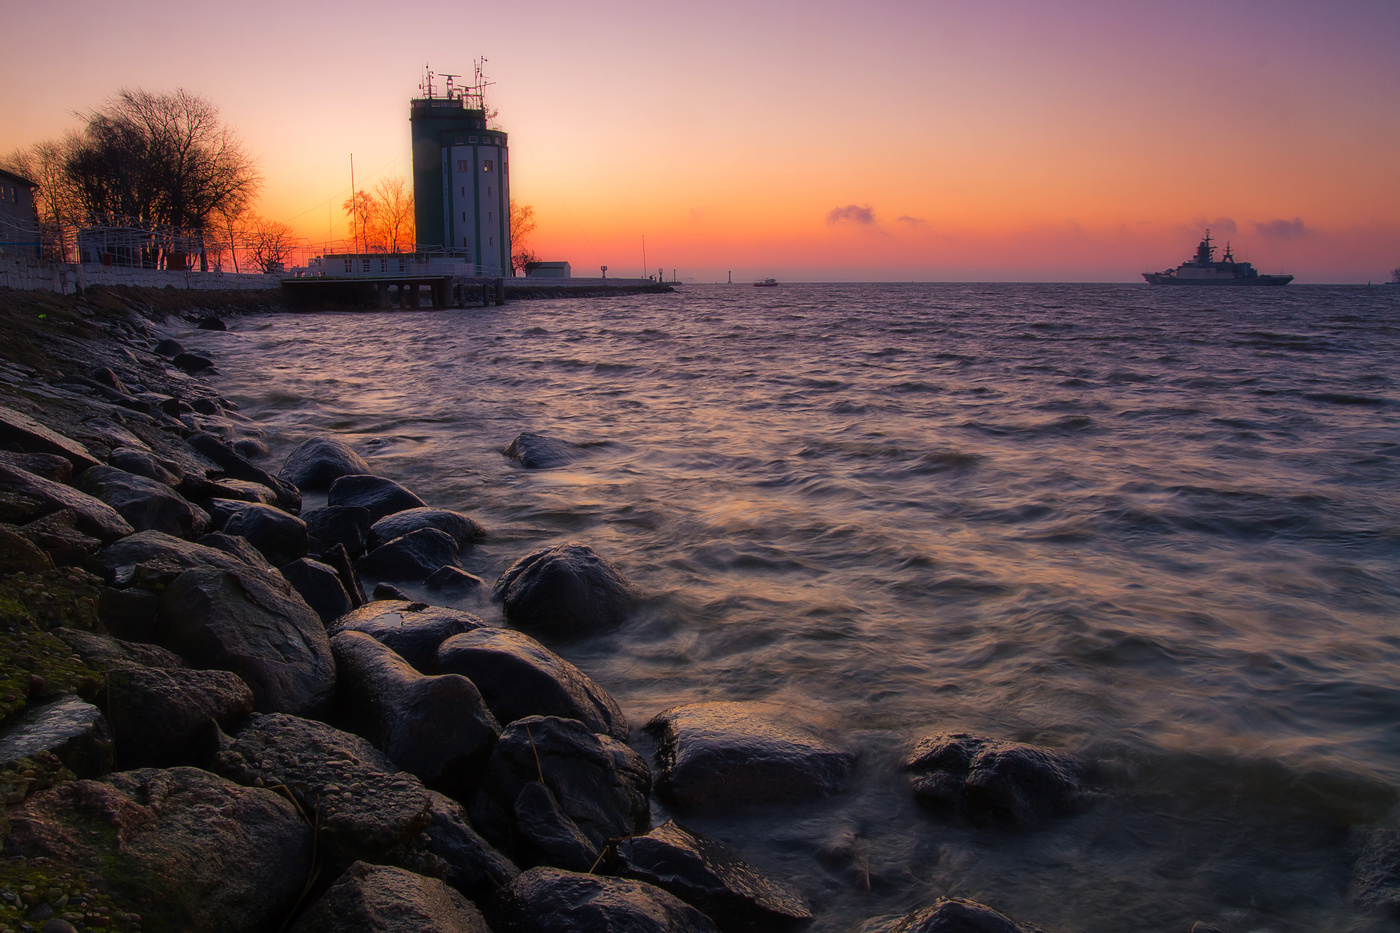 картинки балтийска калининградской области фотограф отобразит